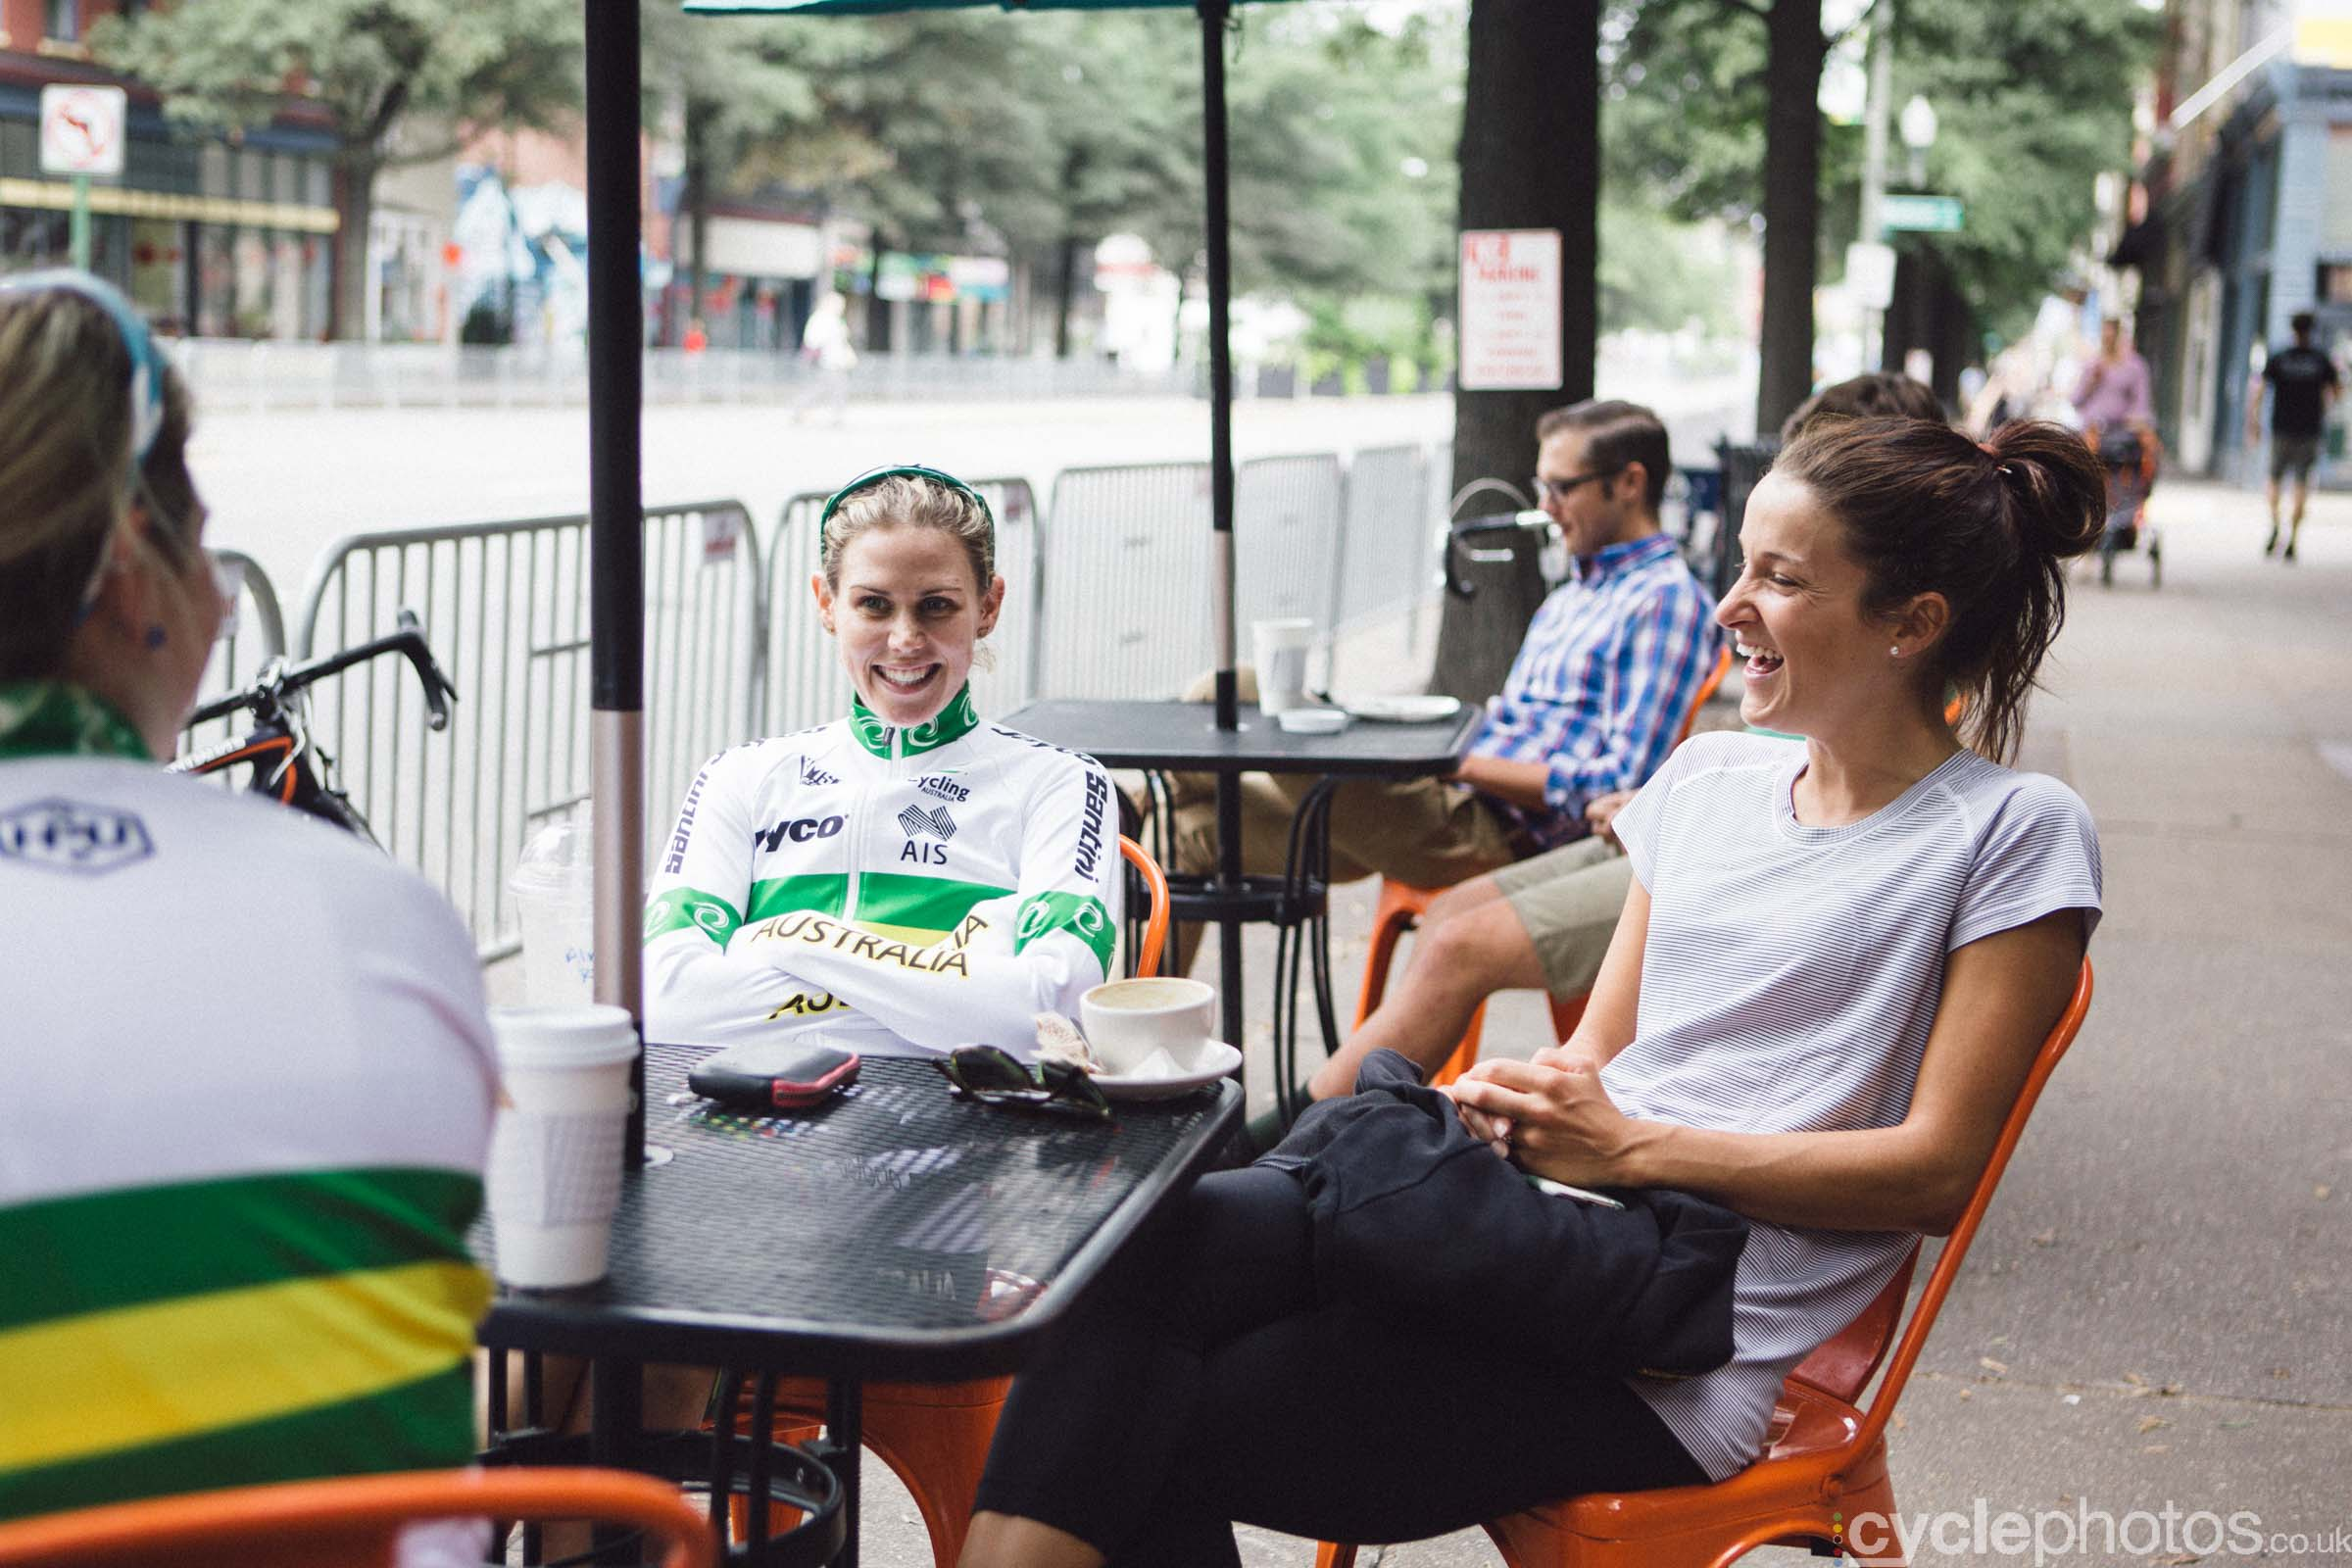 cyclephotos-world-champs-richmond-102915